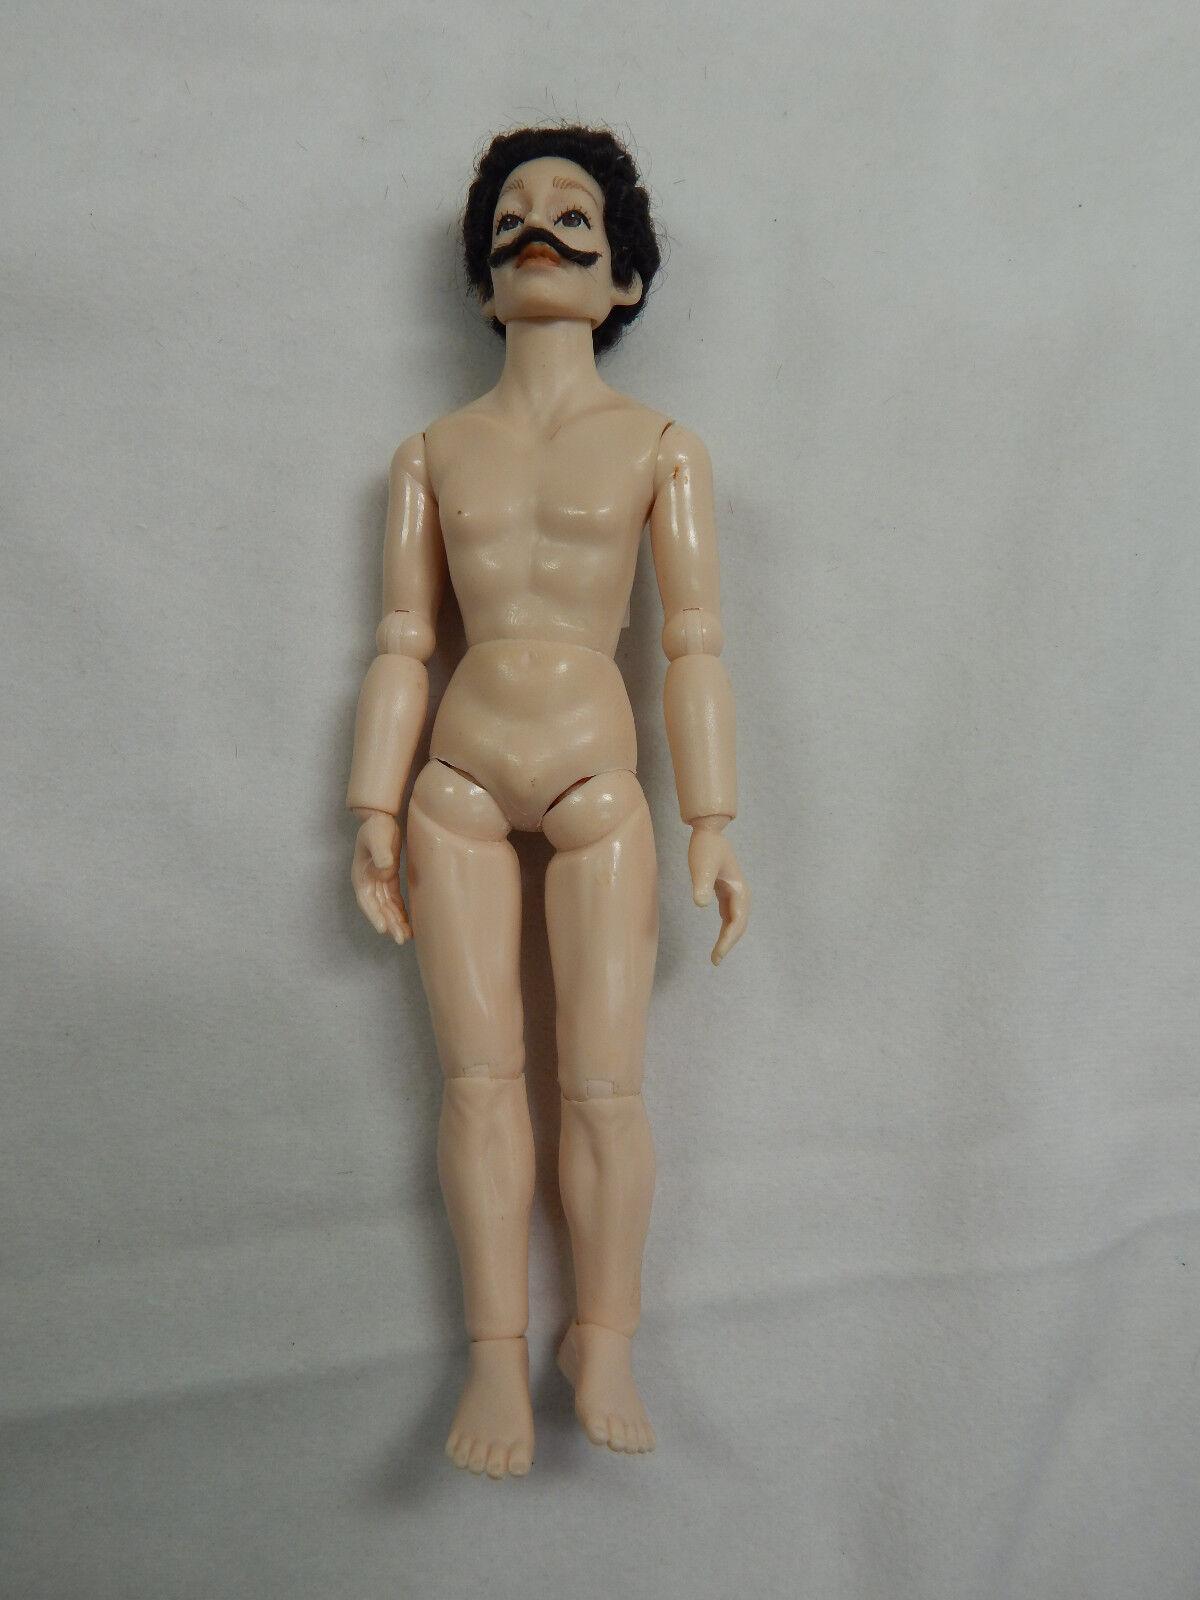 Vuelta de 10 dias Heidi Ott Casa de Muñecas en Miniatura Miniatura Miniatura 6  Desnudo Hombre masculina de Adultos con ojos azules cabello  XKM12  grandes precios de descuento